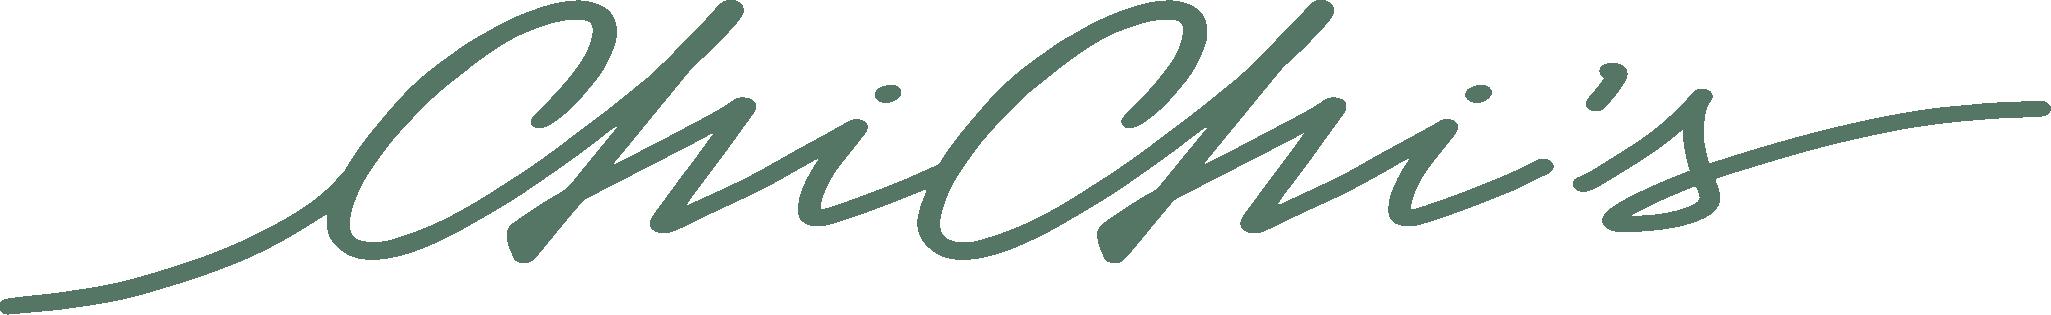 CHI-Logo-V1-Green-1.png